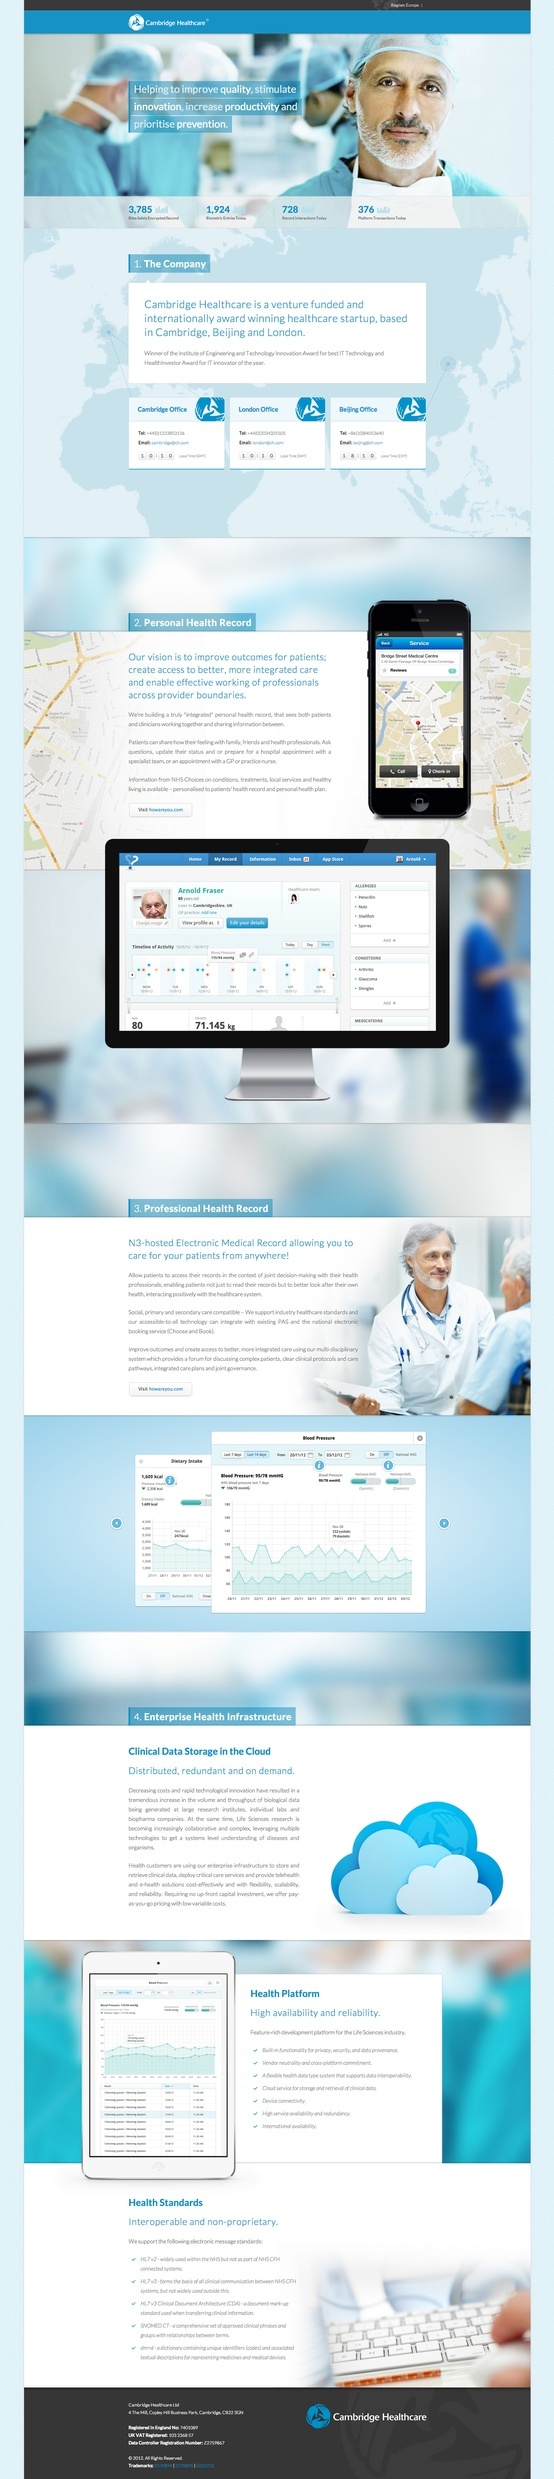 #Medical #Webdesign  83oranges.com